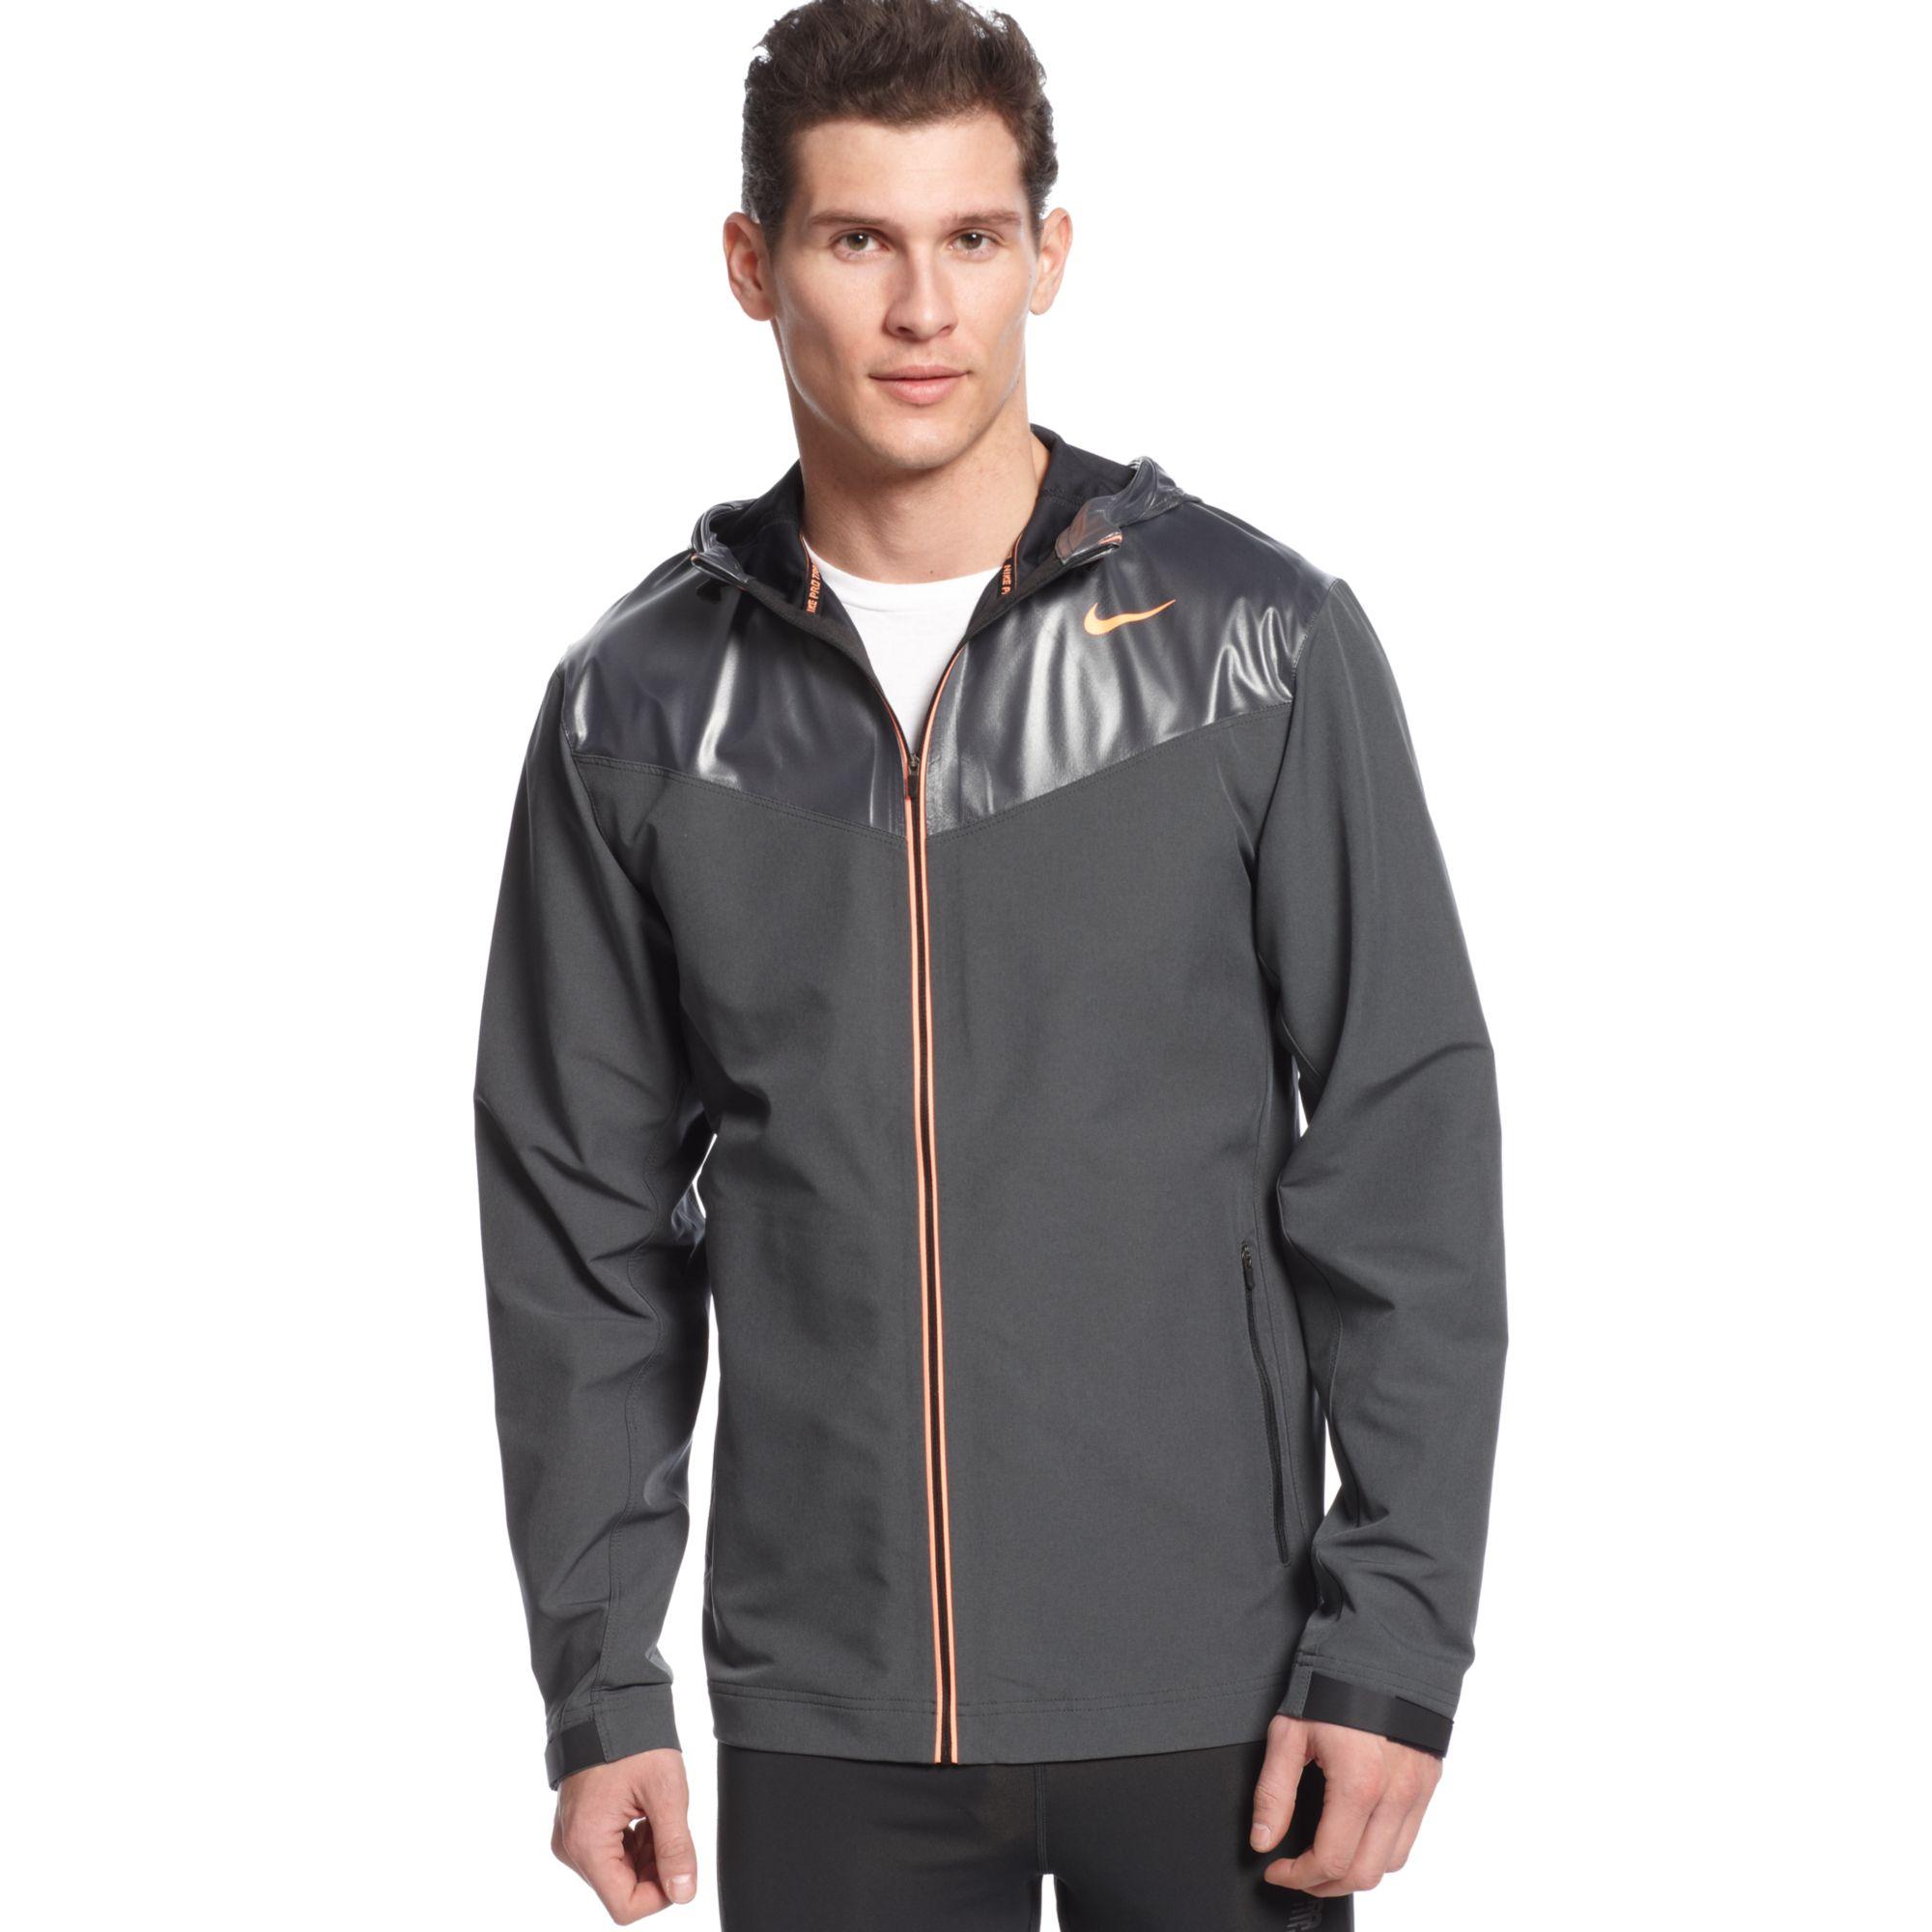 Nike Sweat Less Hooded Jacket In Gray For Men (DARK GREY